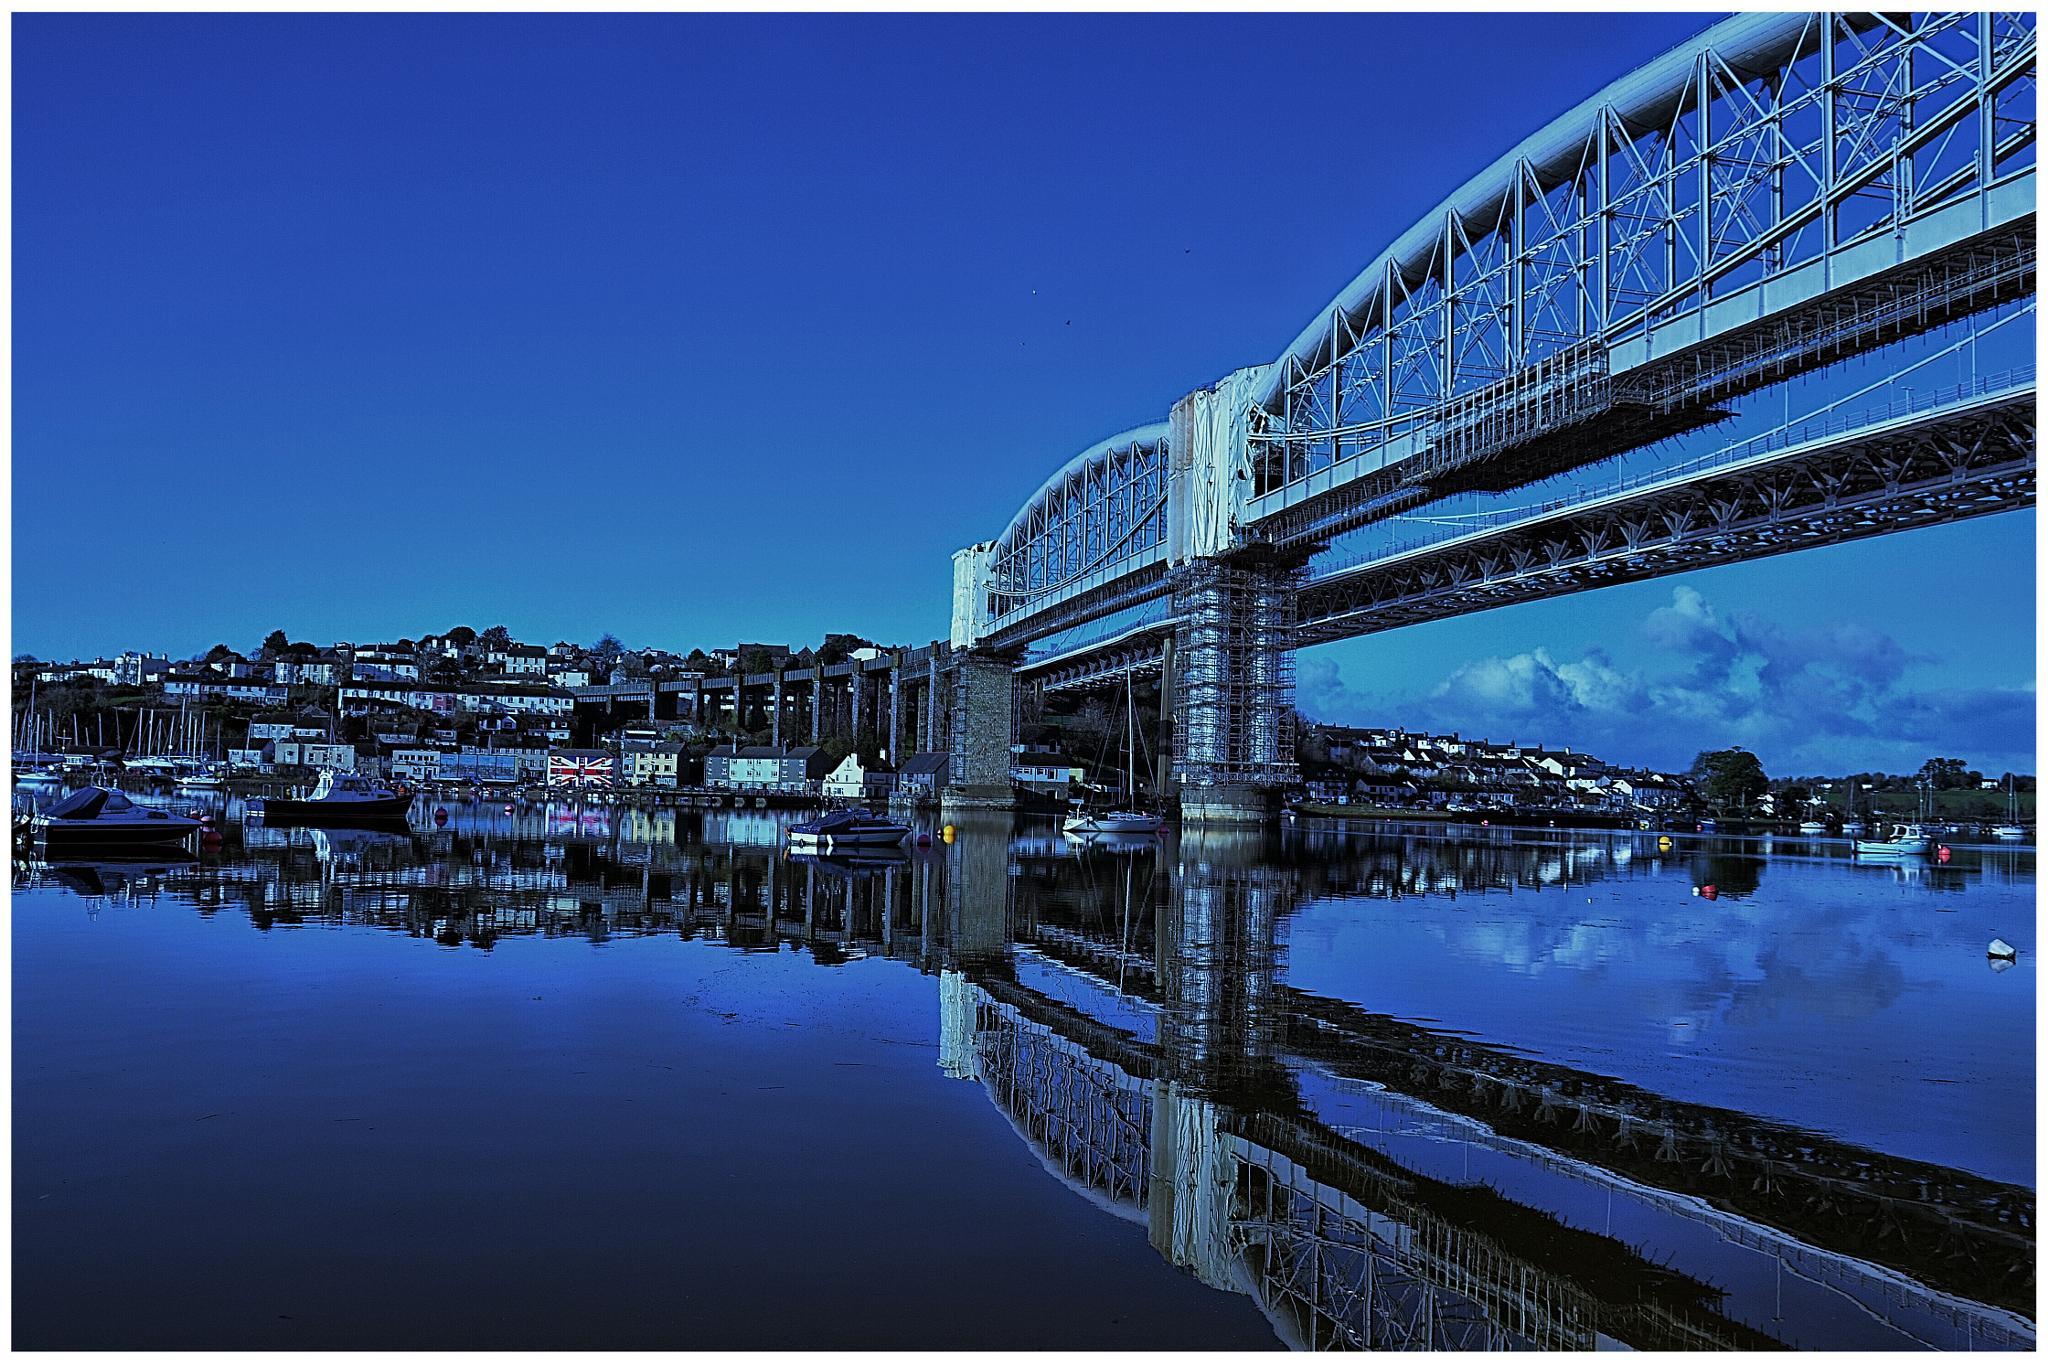 Royal Albert Bridge (2) by johncedriccoles123